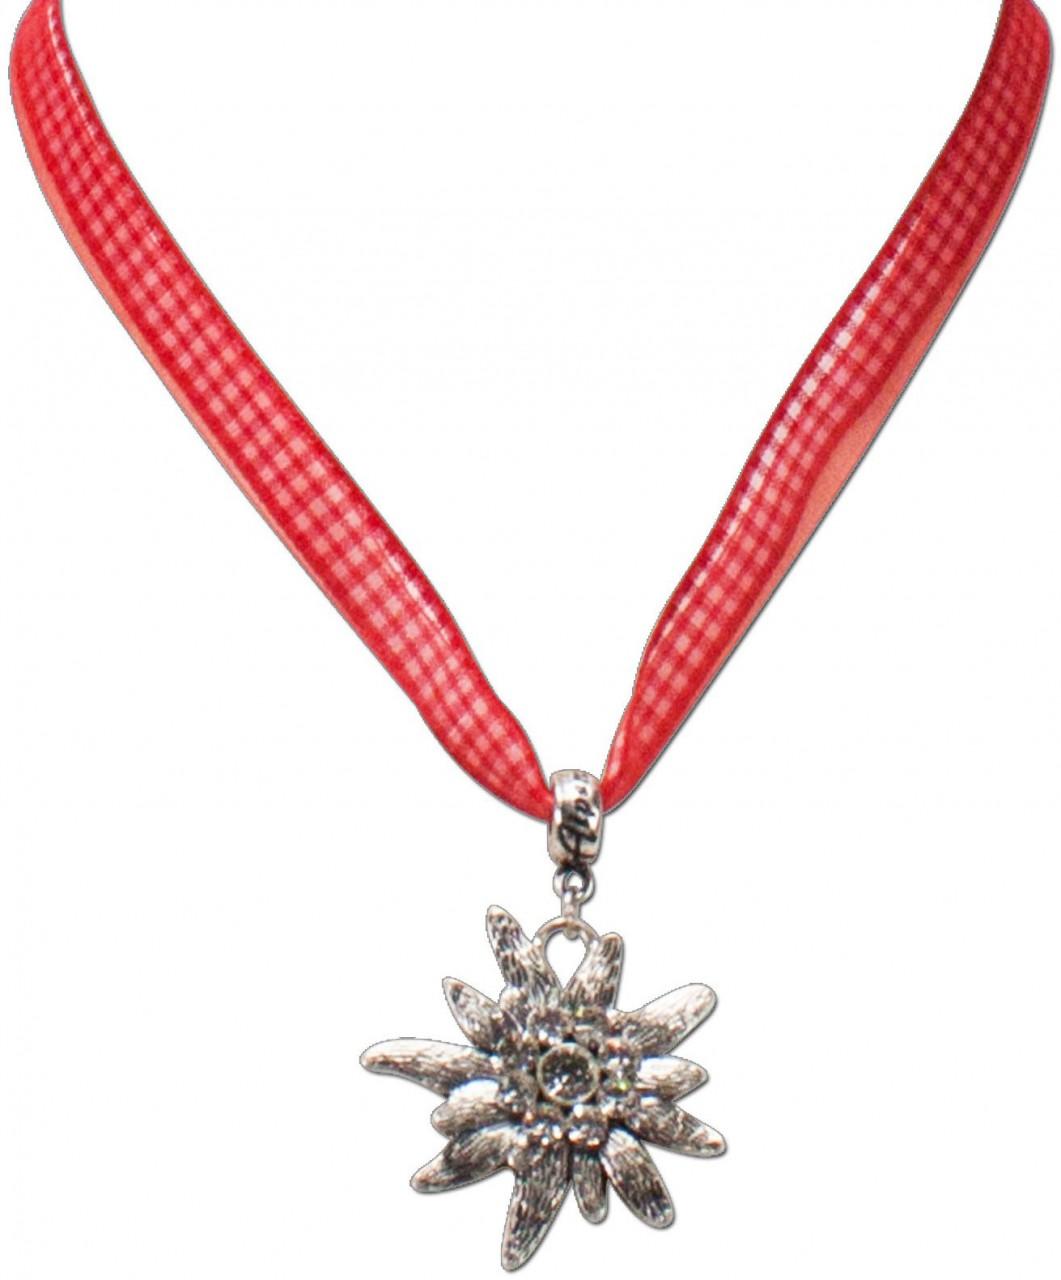 Karoband-Trachtenkette Edelweiß rot